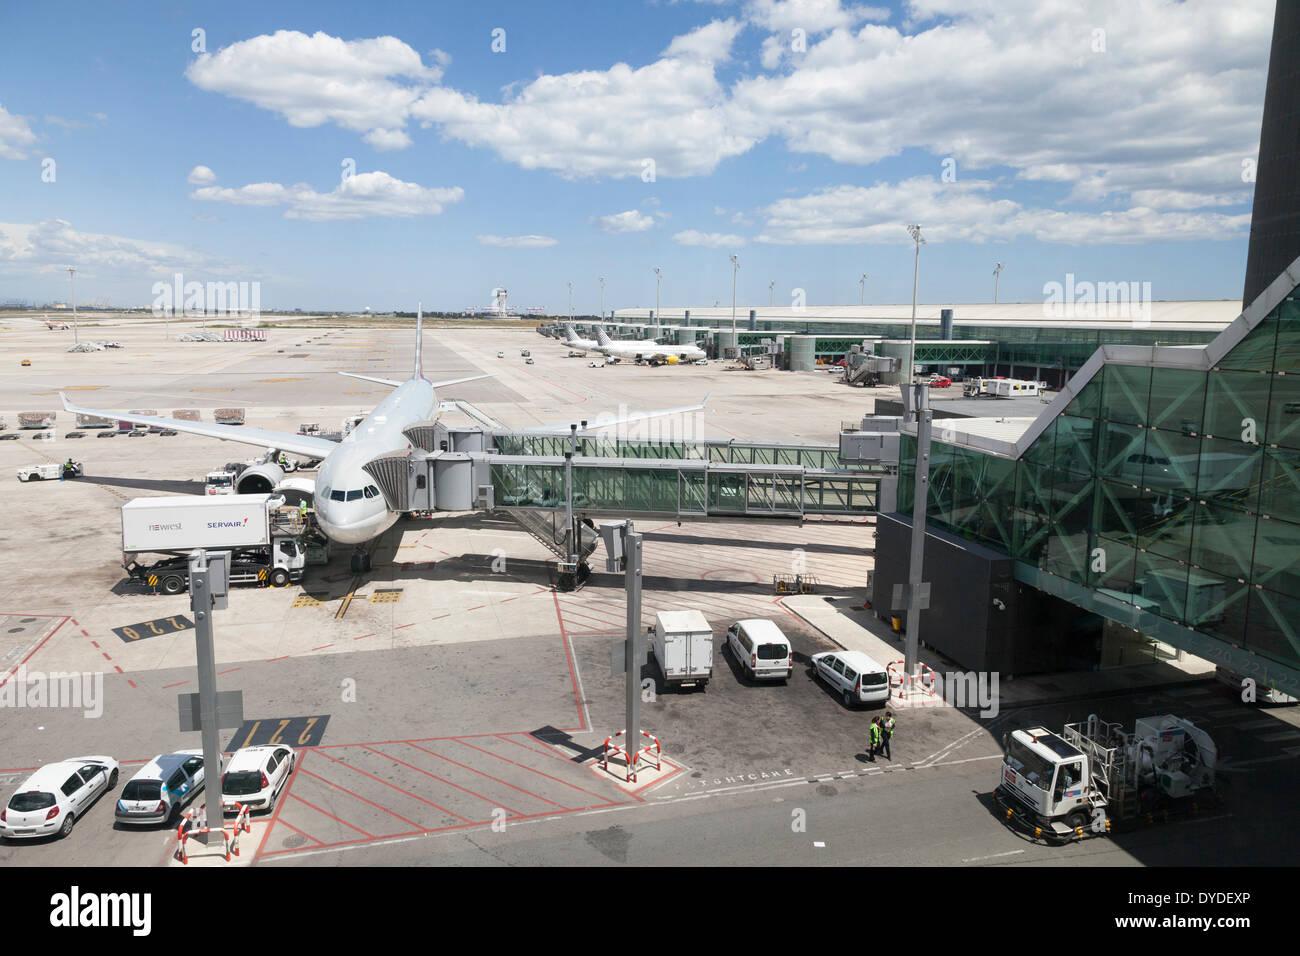 barcelona airport stockfotos barcelona airport bilder. Black Bedroom Furniture Sets. Home Design Ideas